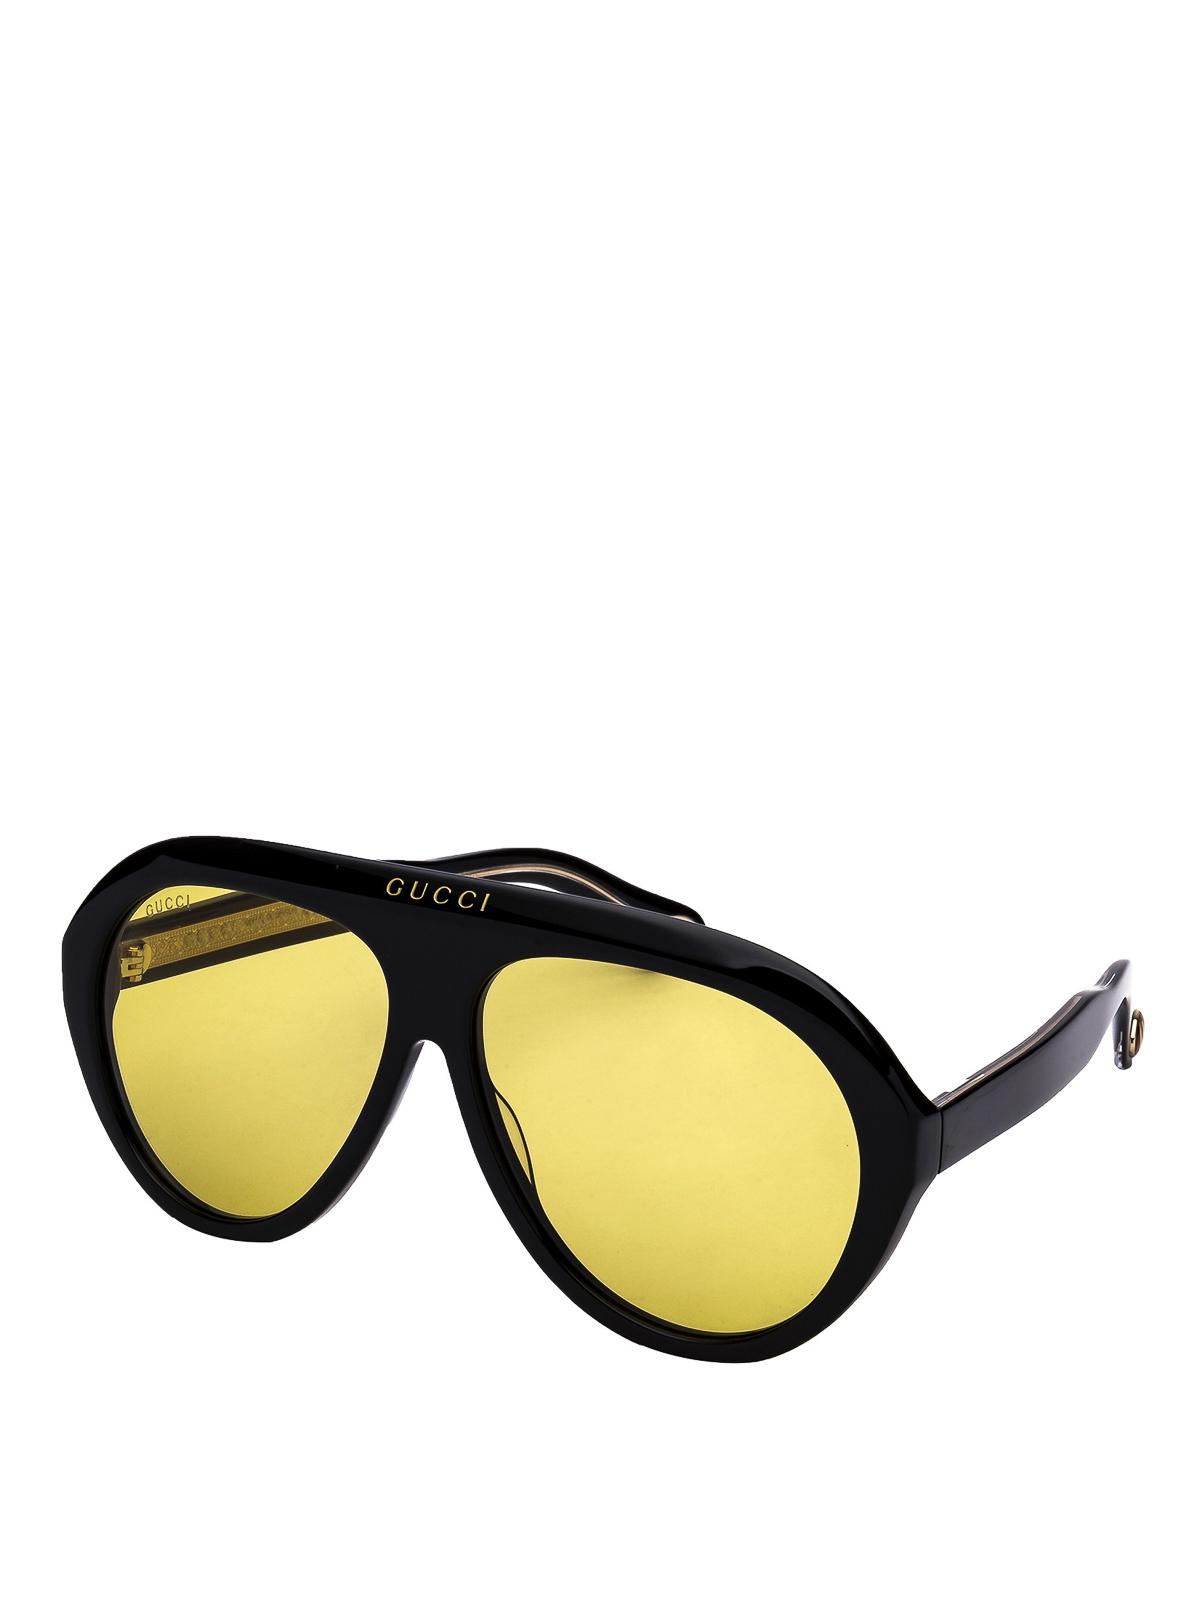 b7b99398cc1 Gucci - Navigator sunglasses with yellow lenses - sunglasses ...